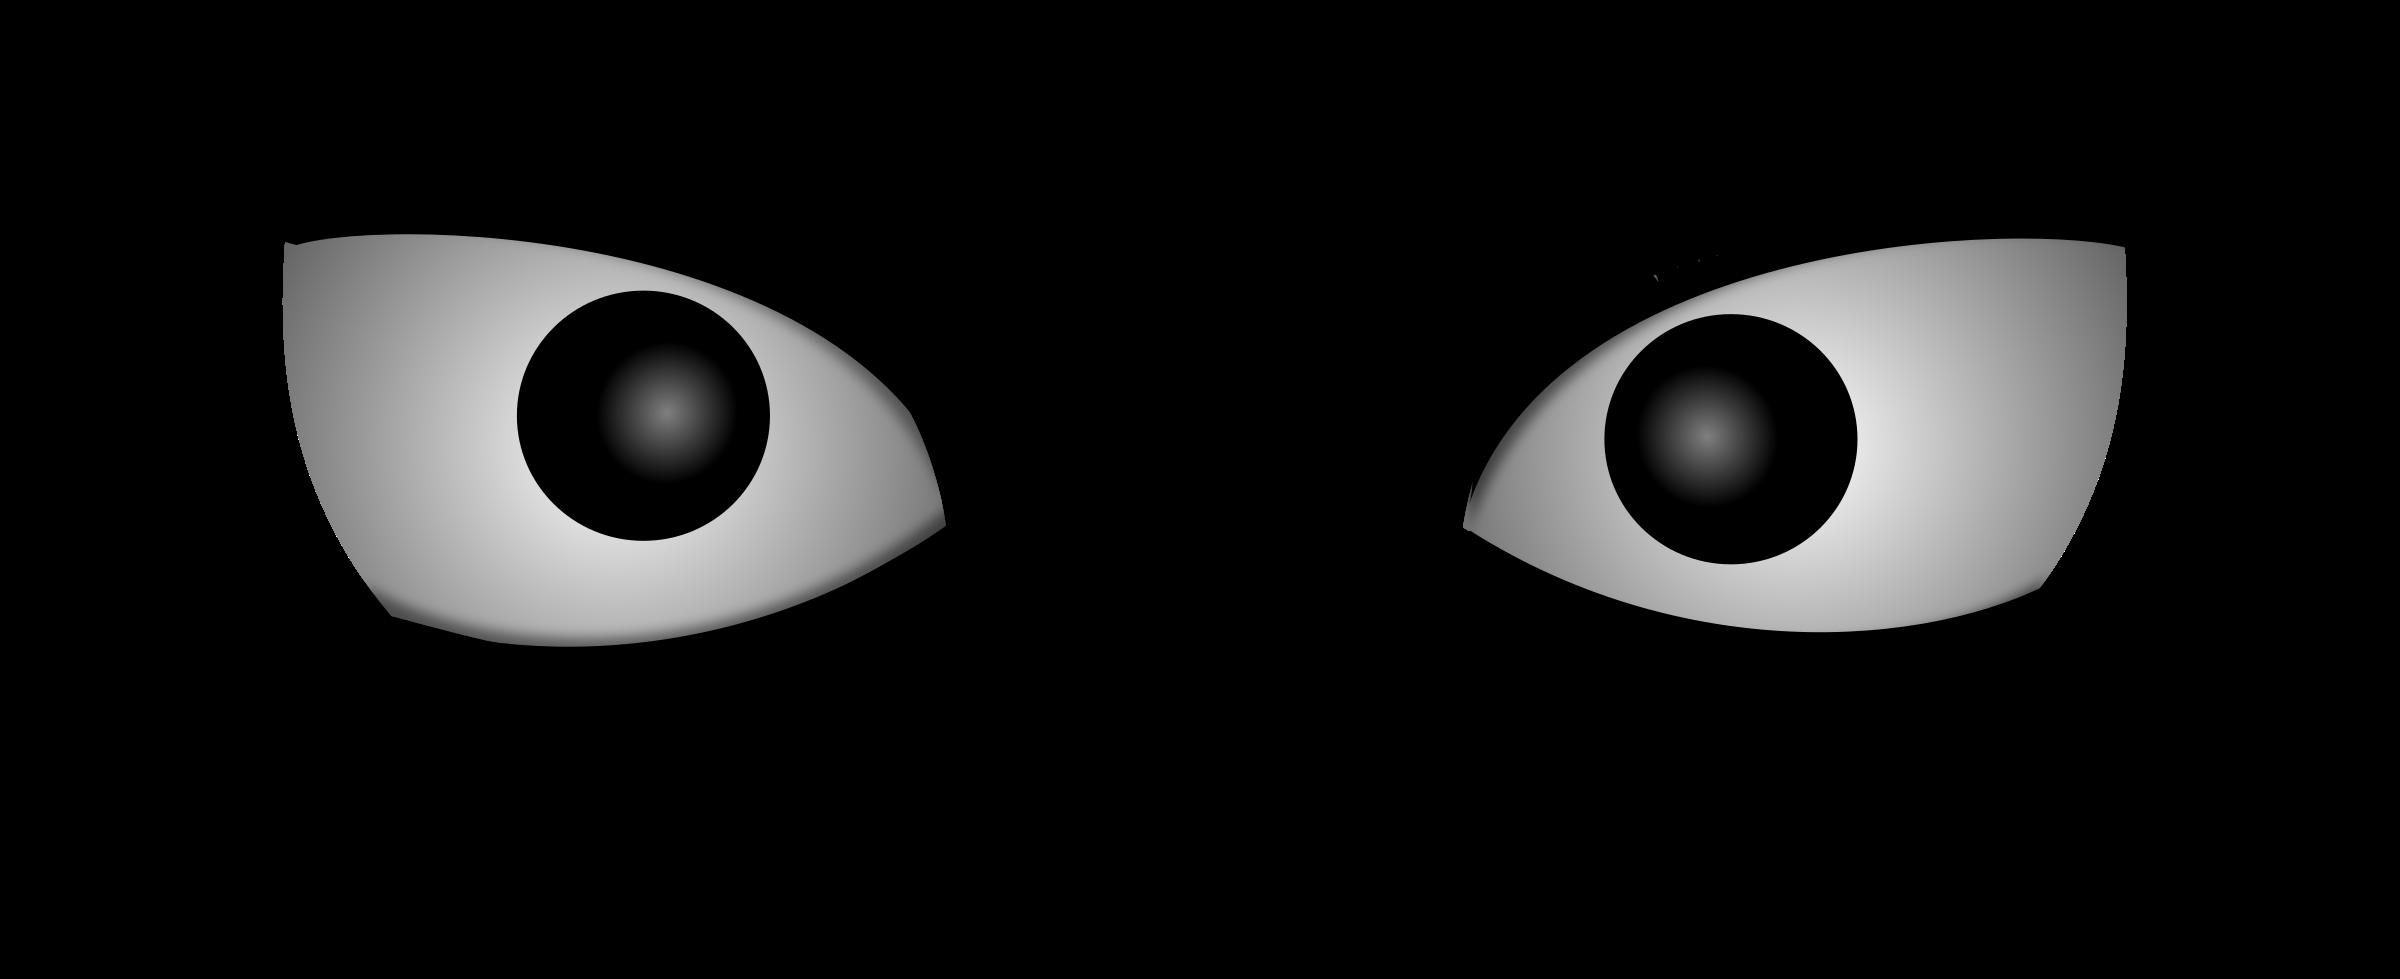 Eyelash clipart vector. Mad eyes big image